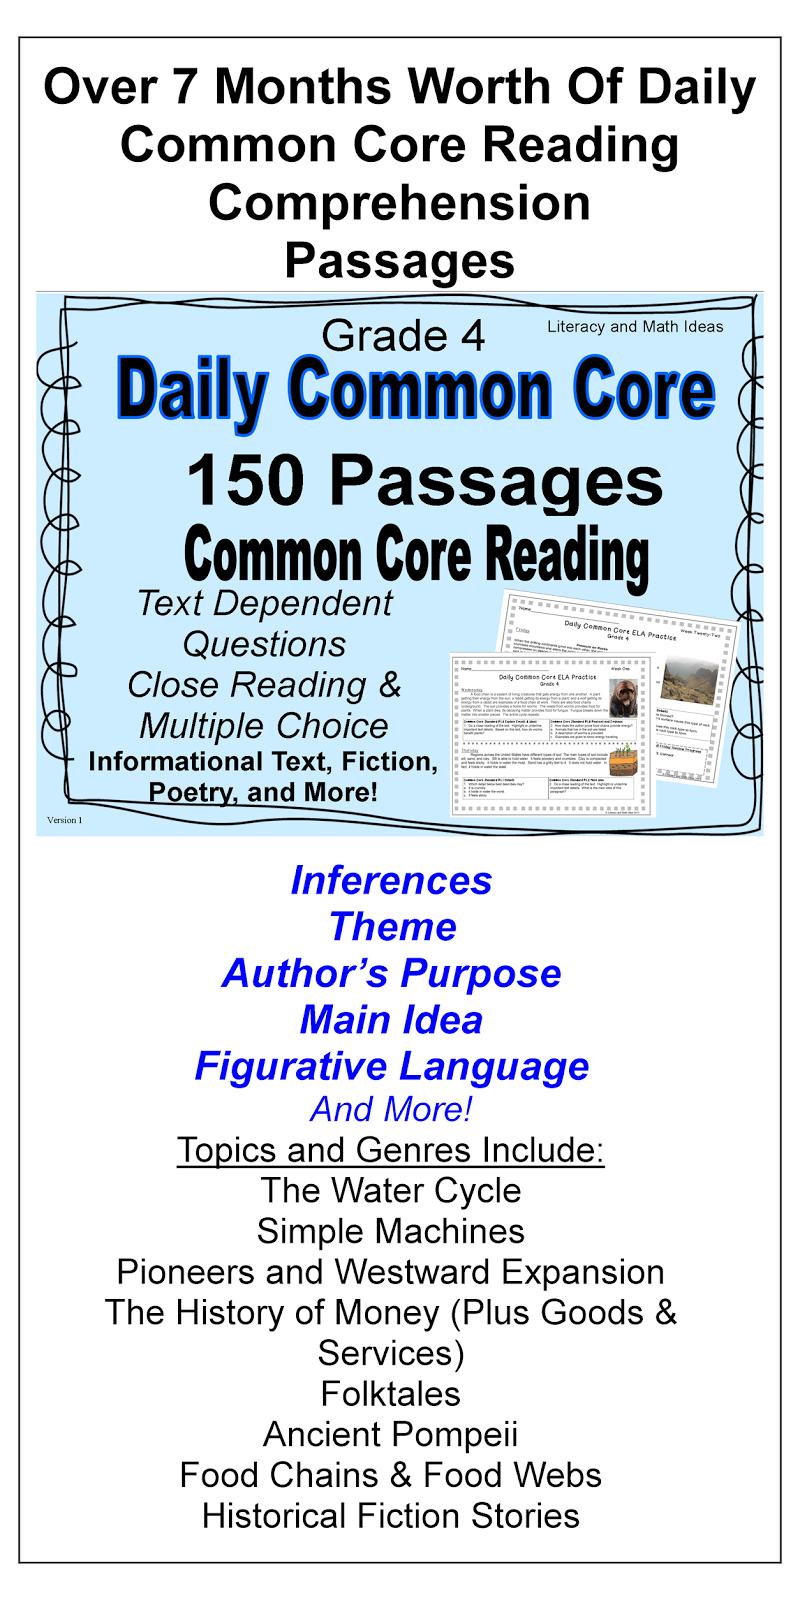 Common Core Worksheets 5th Grade Language Arts CCSS - mandegar.info